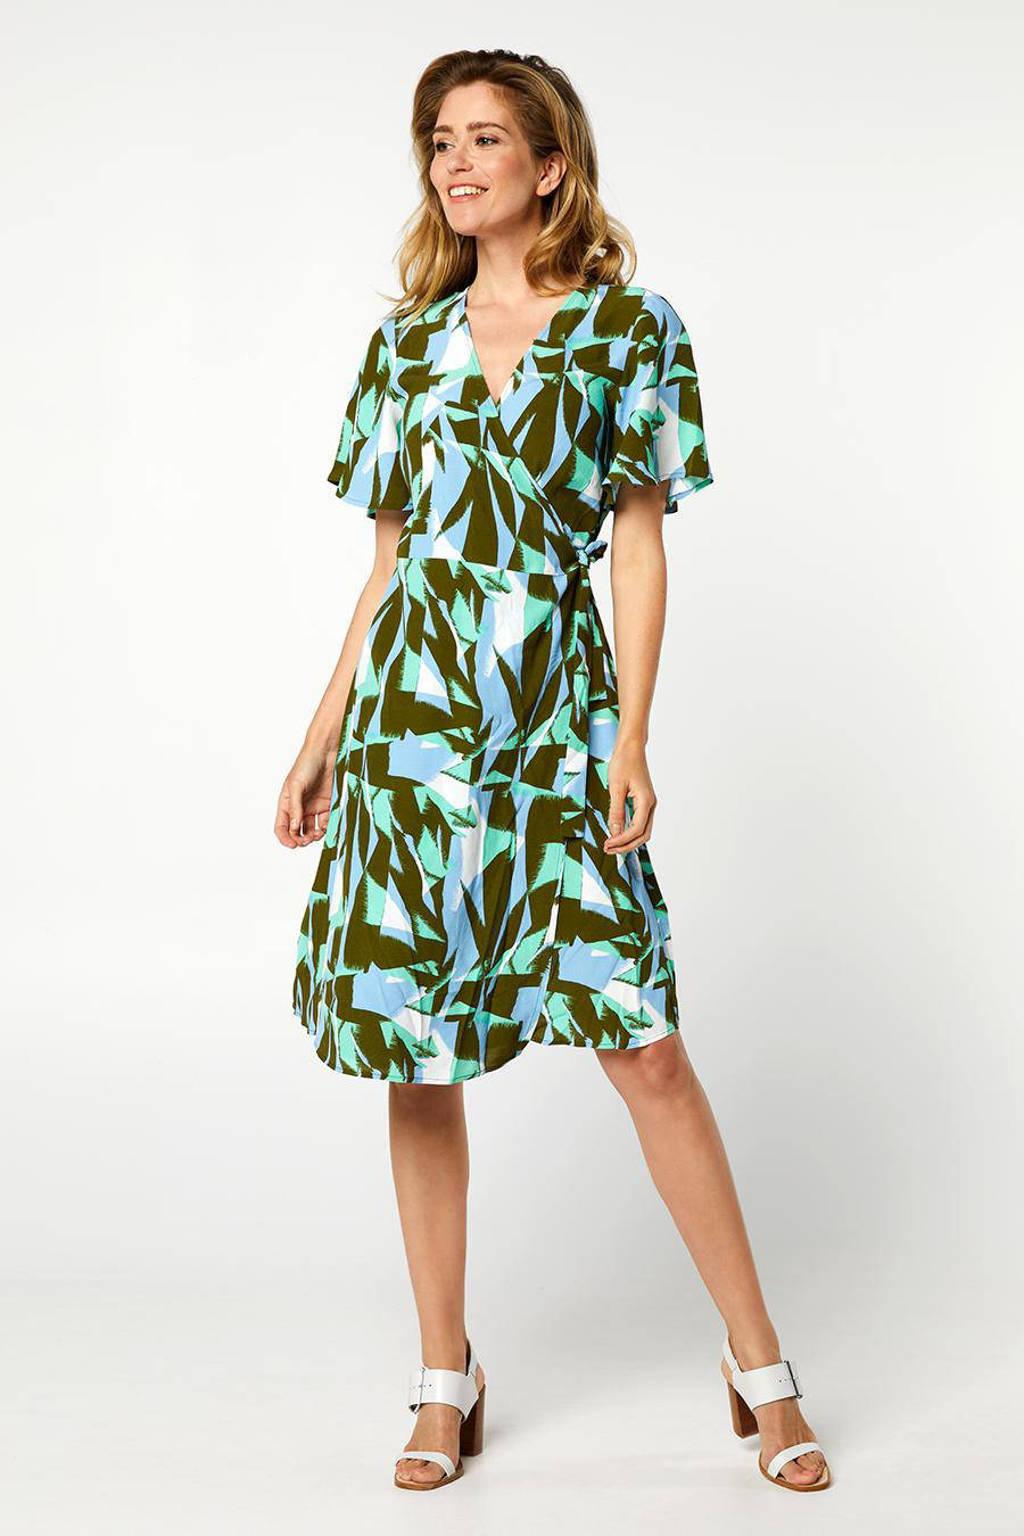 Miss Etam Regulier jurk met all over print blauw/groen, Blauw/groen